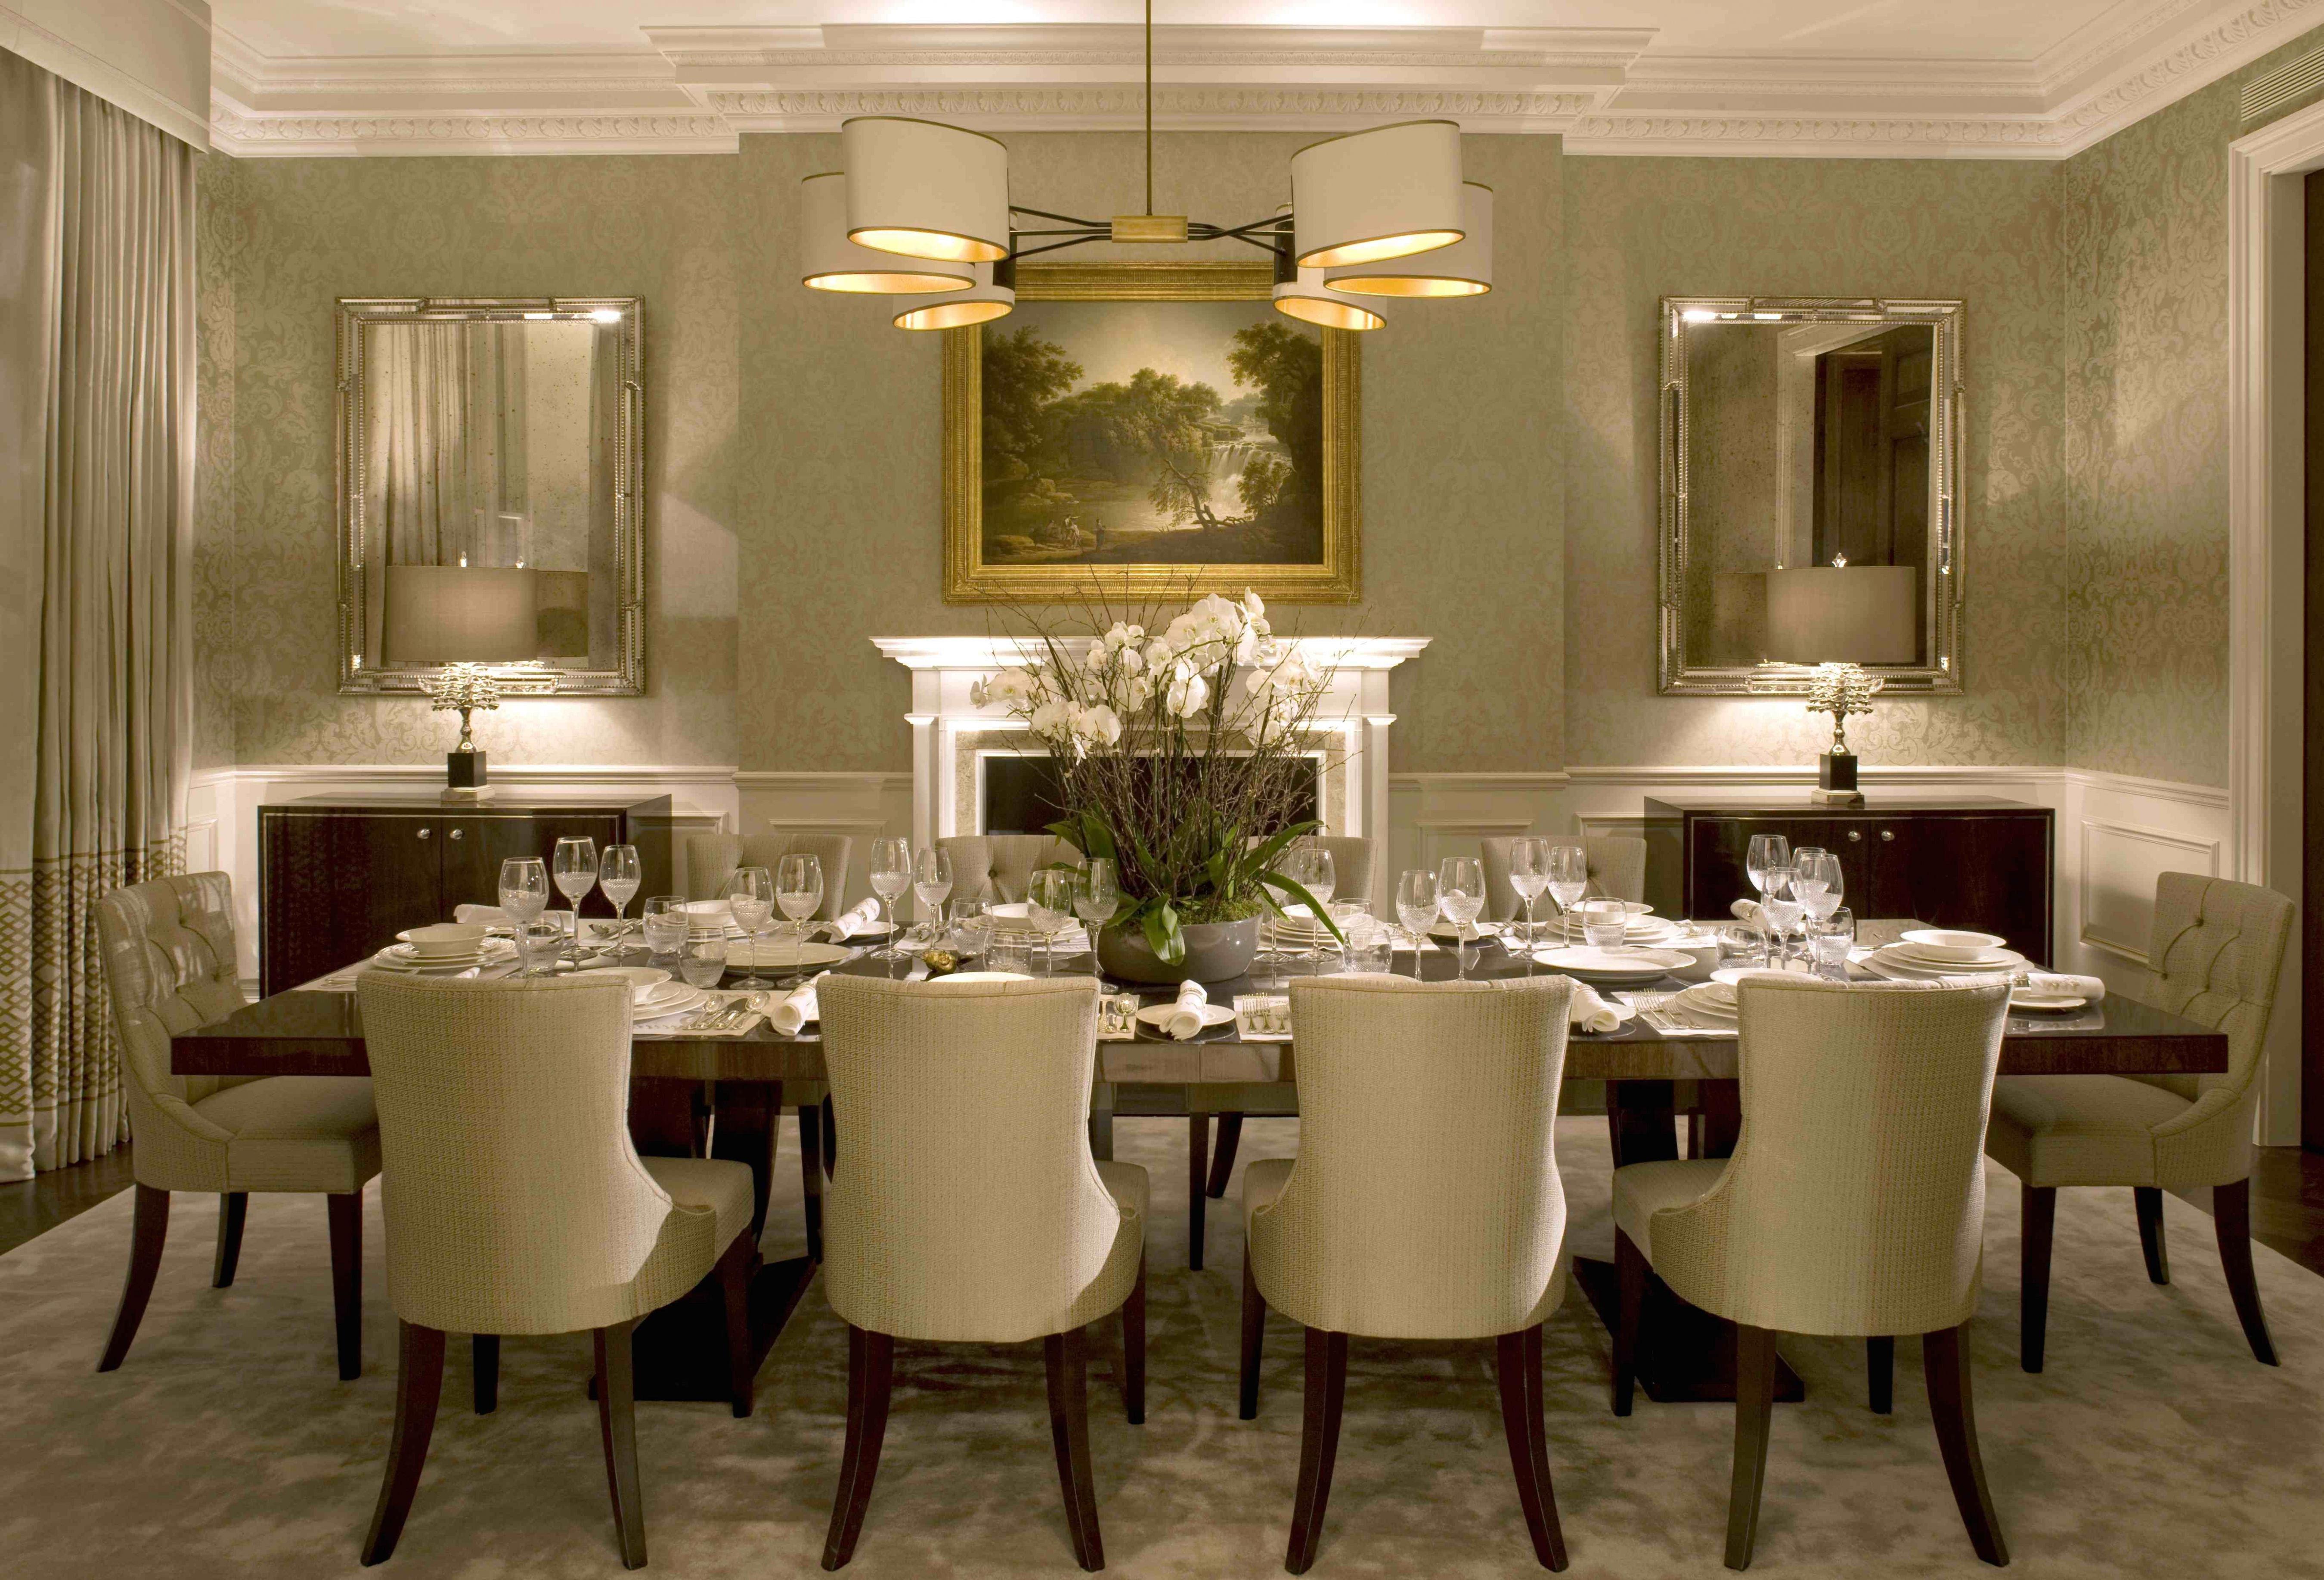 Modern Living Dining Room Decorating Ideas Alluring formal Dining Room Ideas Your Residence Idea